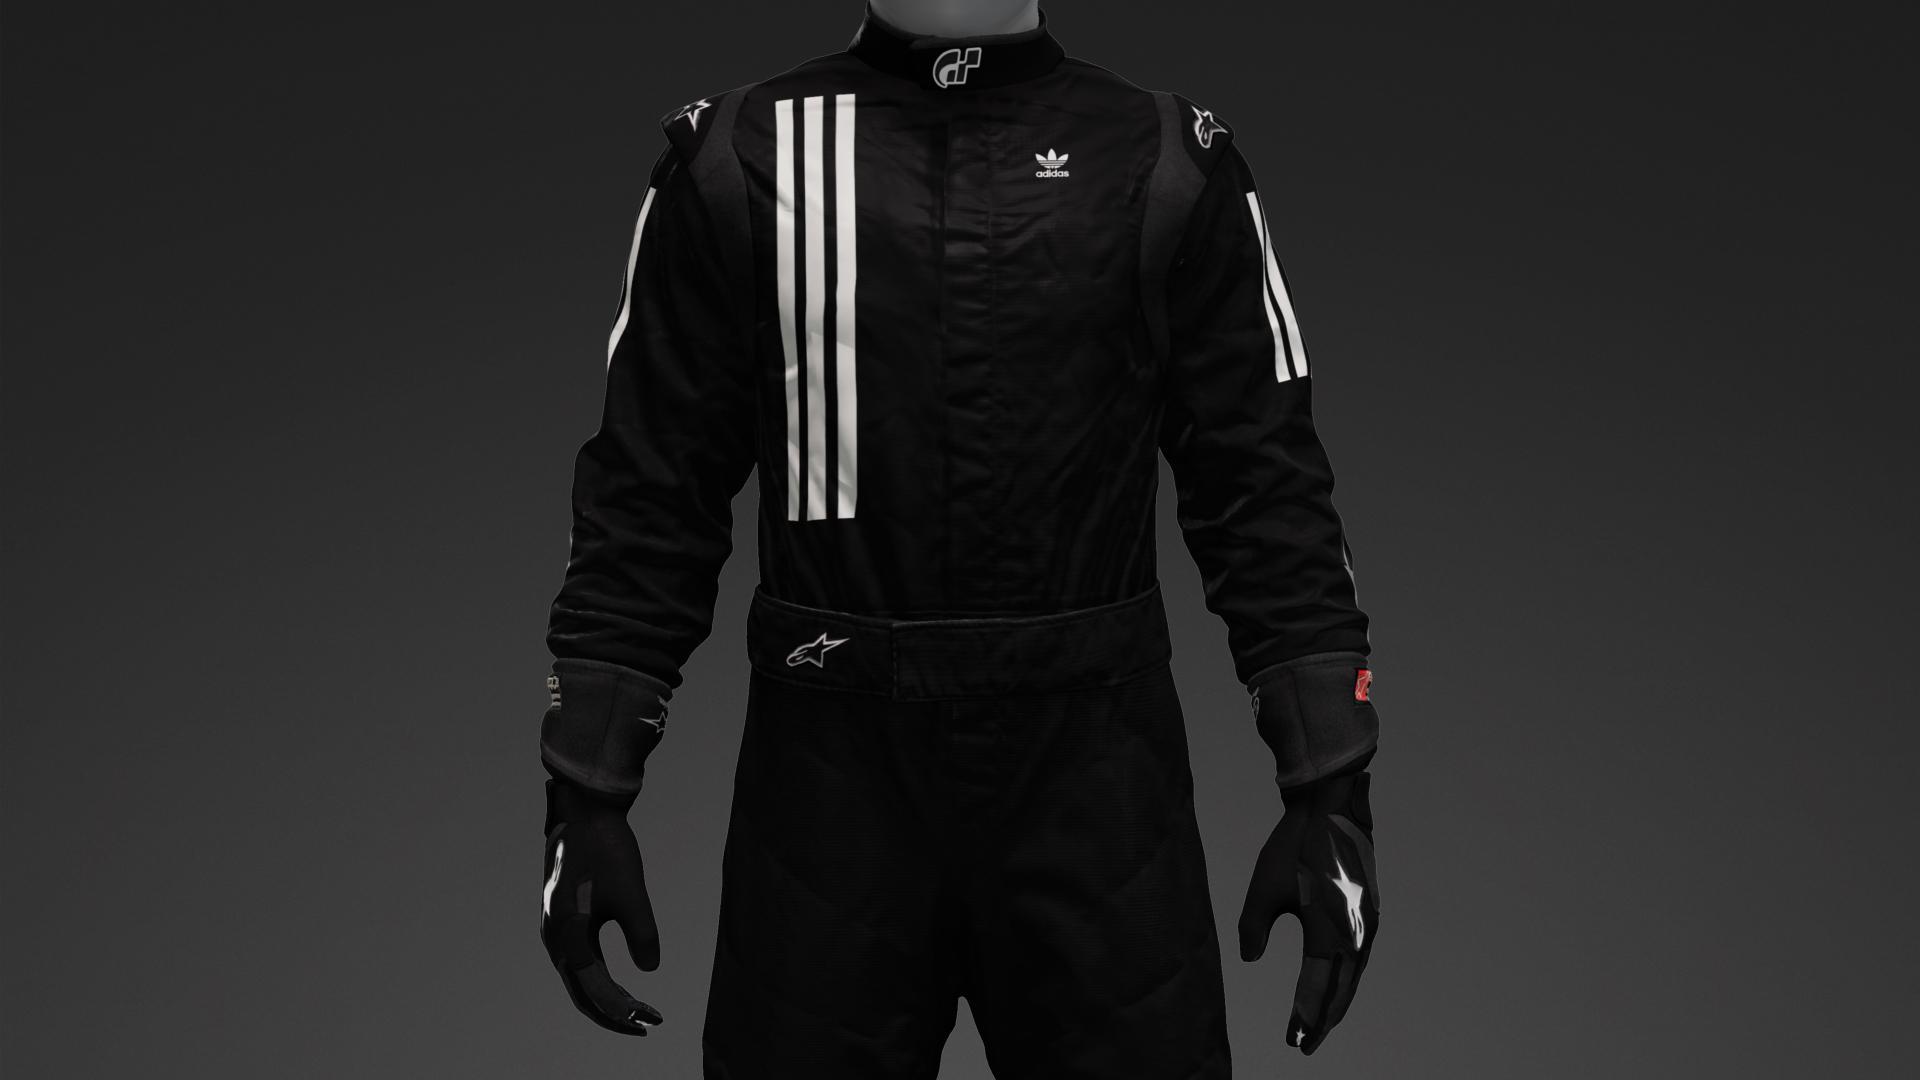 Adidas Pilot Vest Suit Livery by Sentinel02ITA | Community